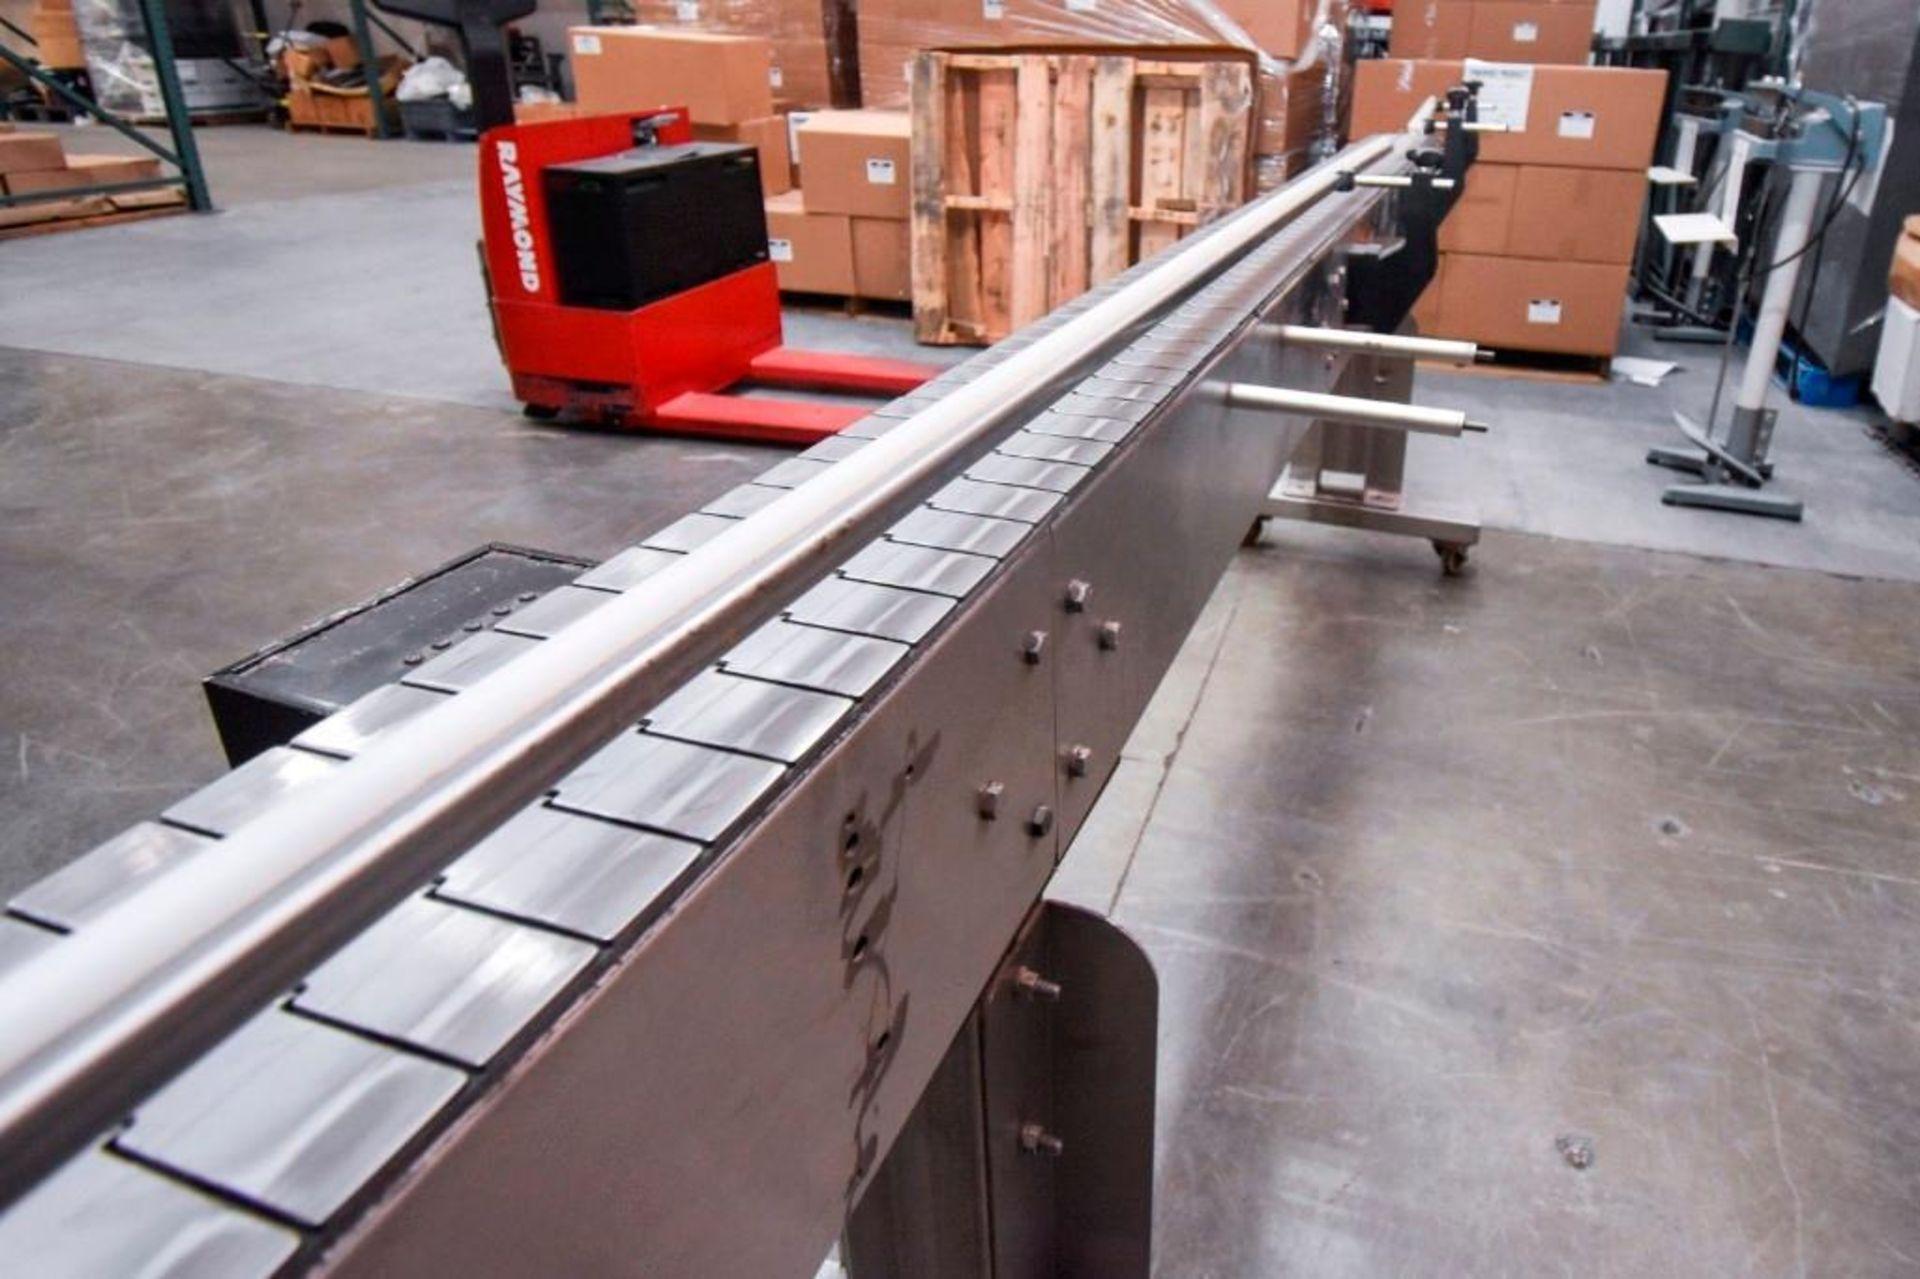 Axon Variable Speed Conveyor - Image 6 of 9